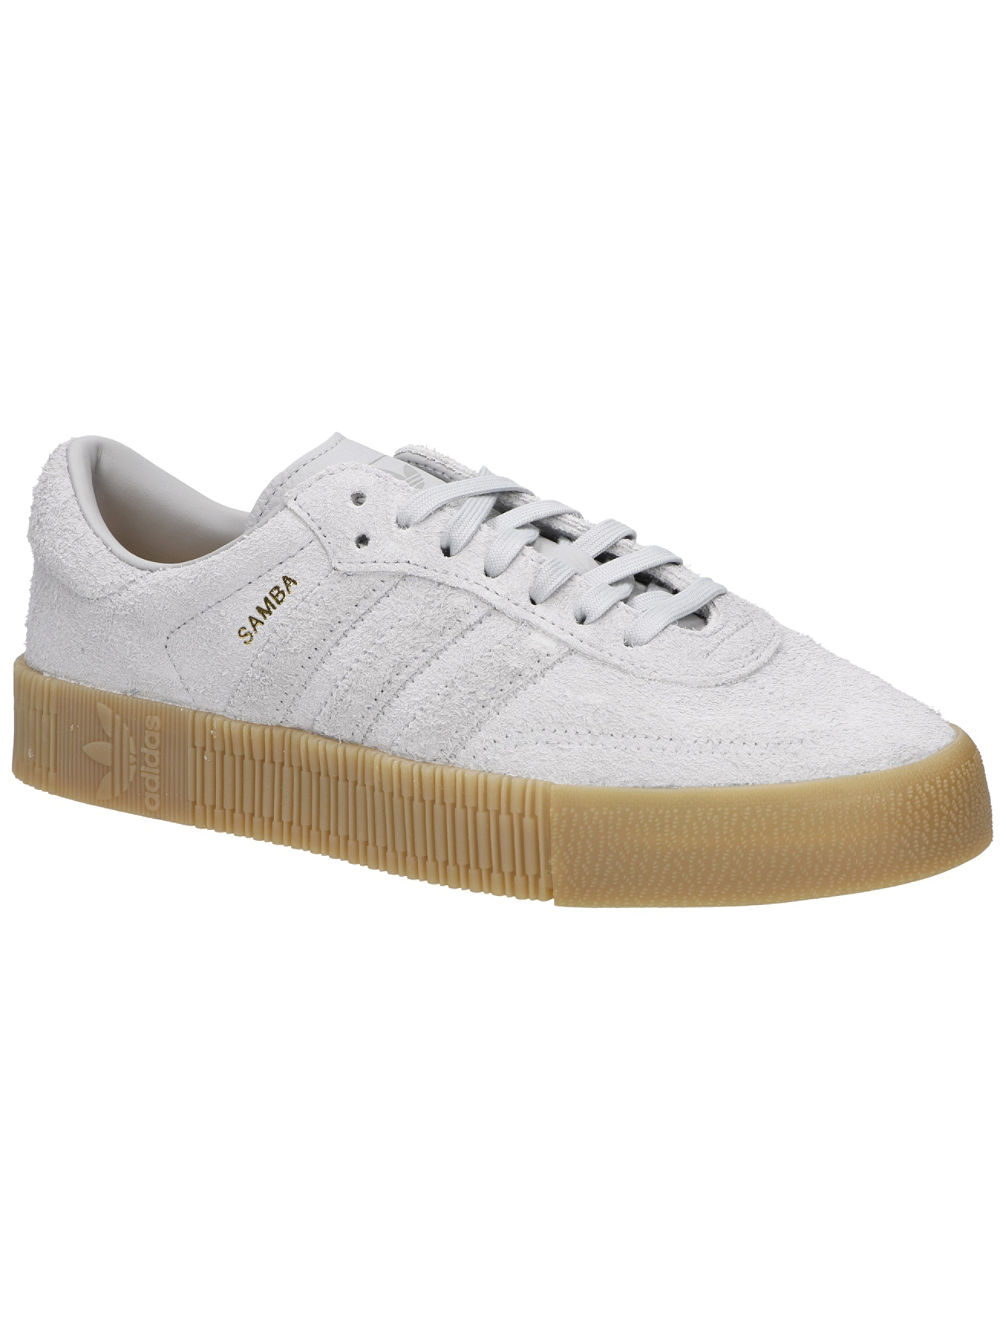 a98e1d12c09c Buy adidas Originals Sambarose Sneakers online at Blue Tomato